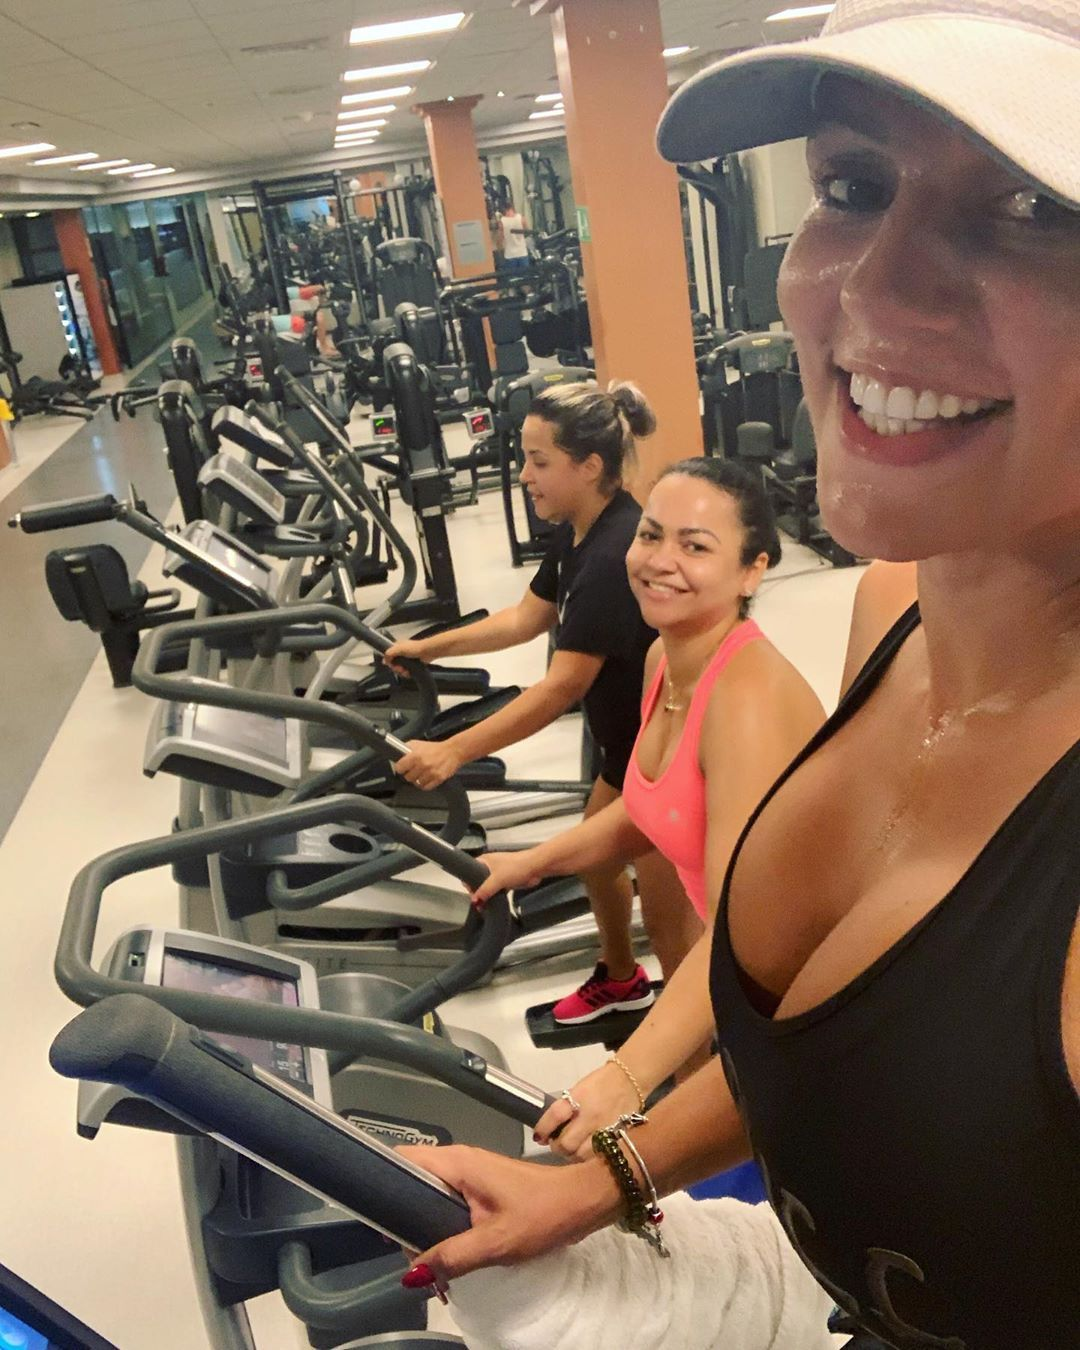 Trio sorrisos 🤣 Da academia hoje ...💪 . . . . . . . . . #treinandocomamigas #👊 #gym  #spagym #reduca...